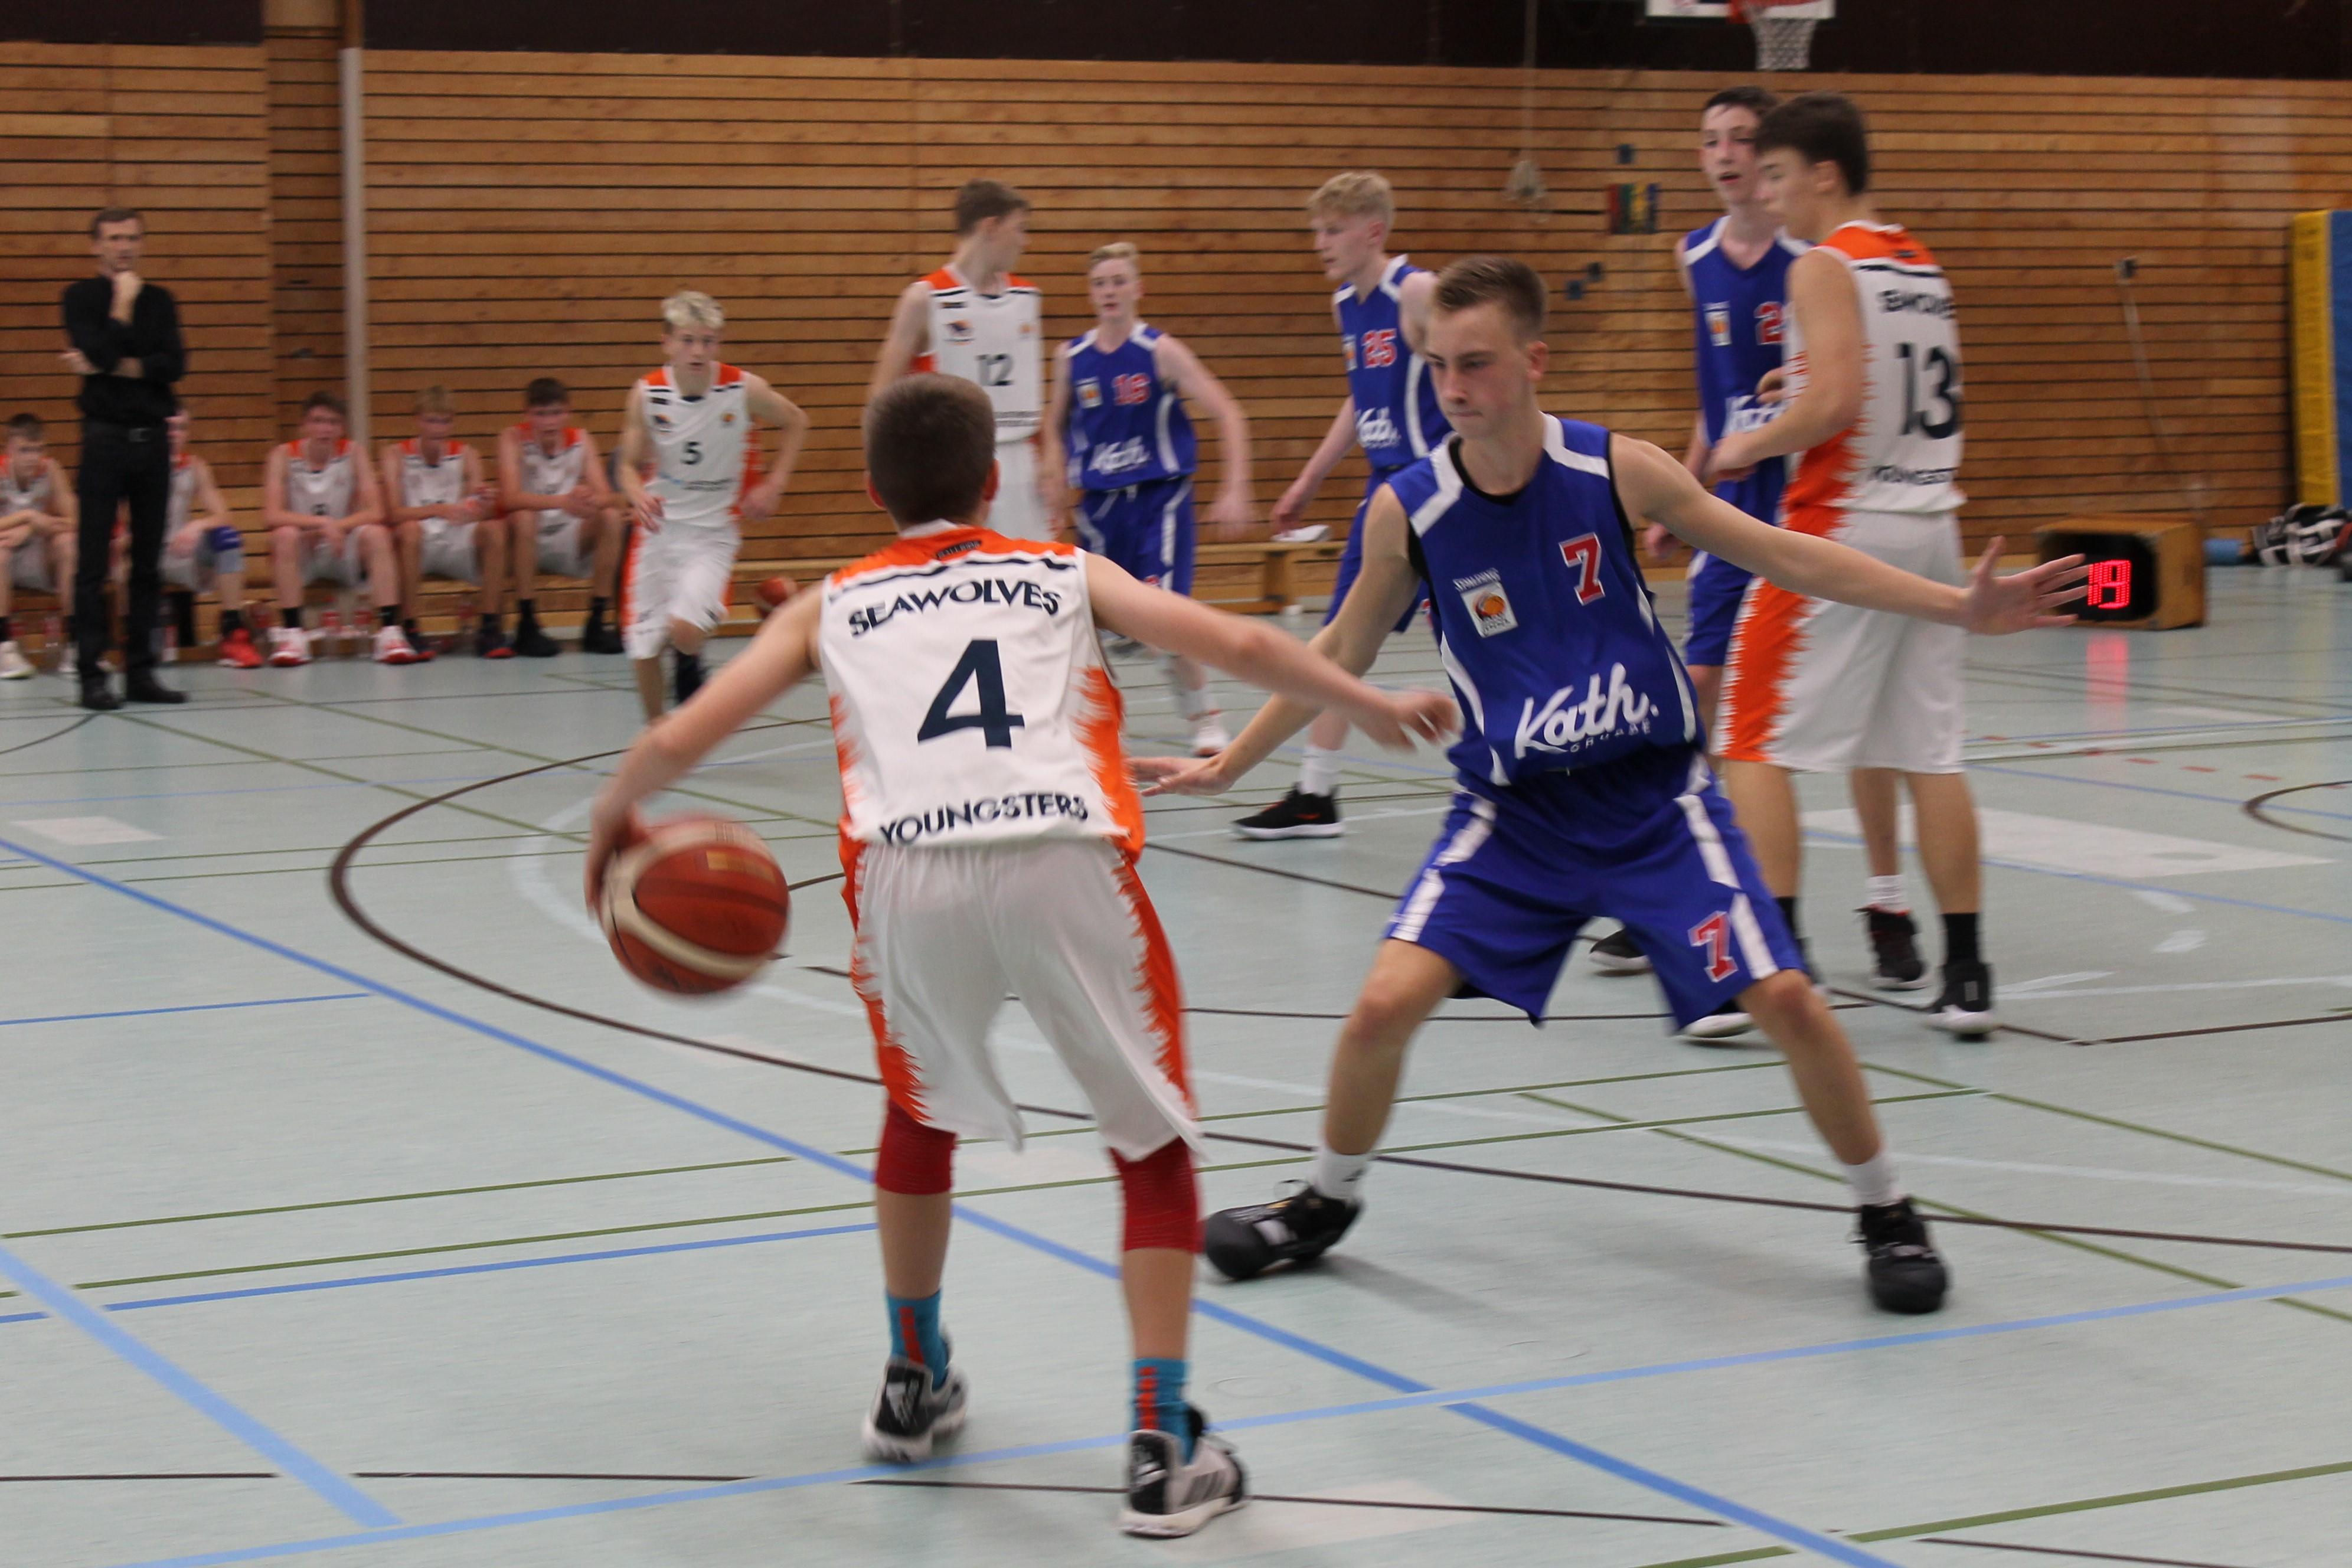 JBBL_19-20_BalticSeaLions_Rostock_Spieltag1_4_krupnikas_philipp7_2